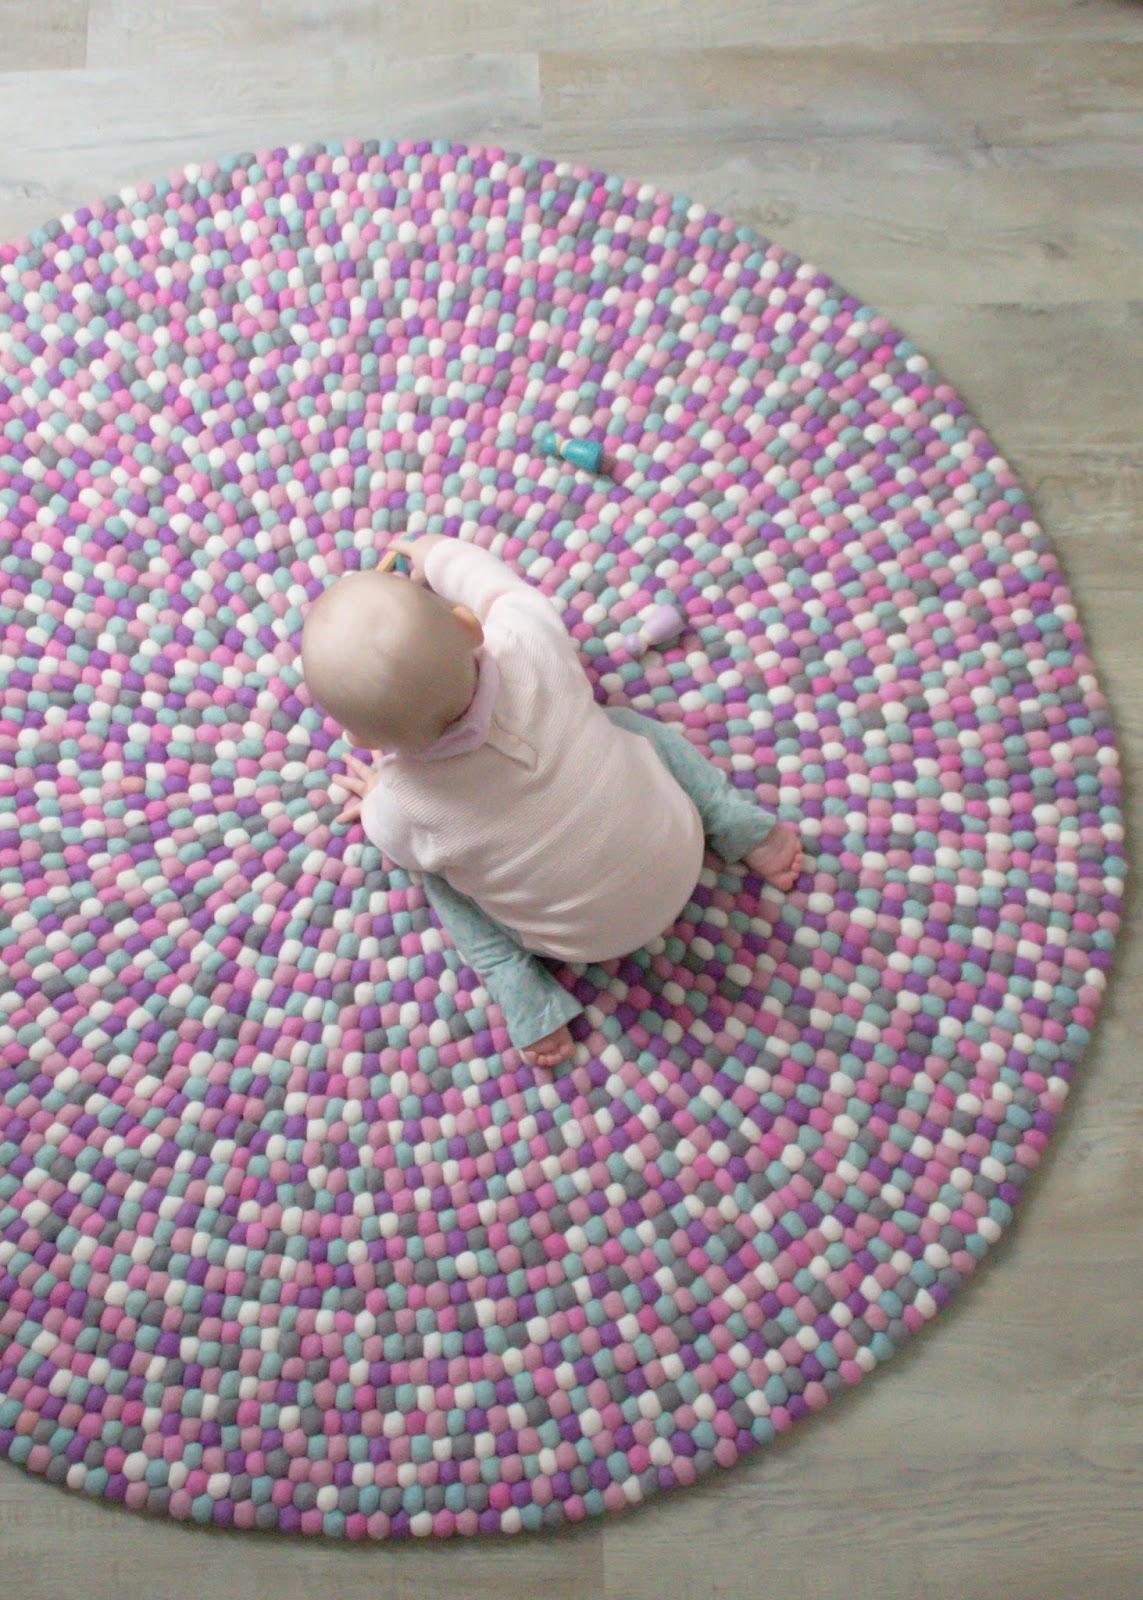 petit et jolie design 100 bunte kugeln gem tlichkeit unser filzkugelteppich. Black Bedroom Furniture Sets. Home Design Ideas